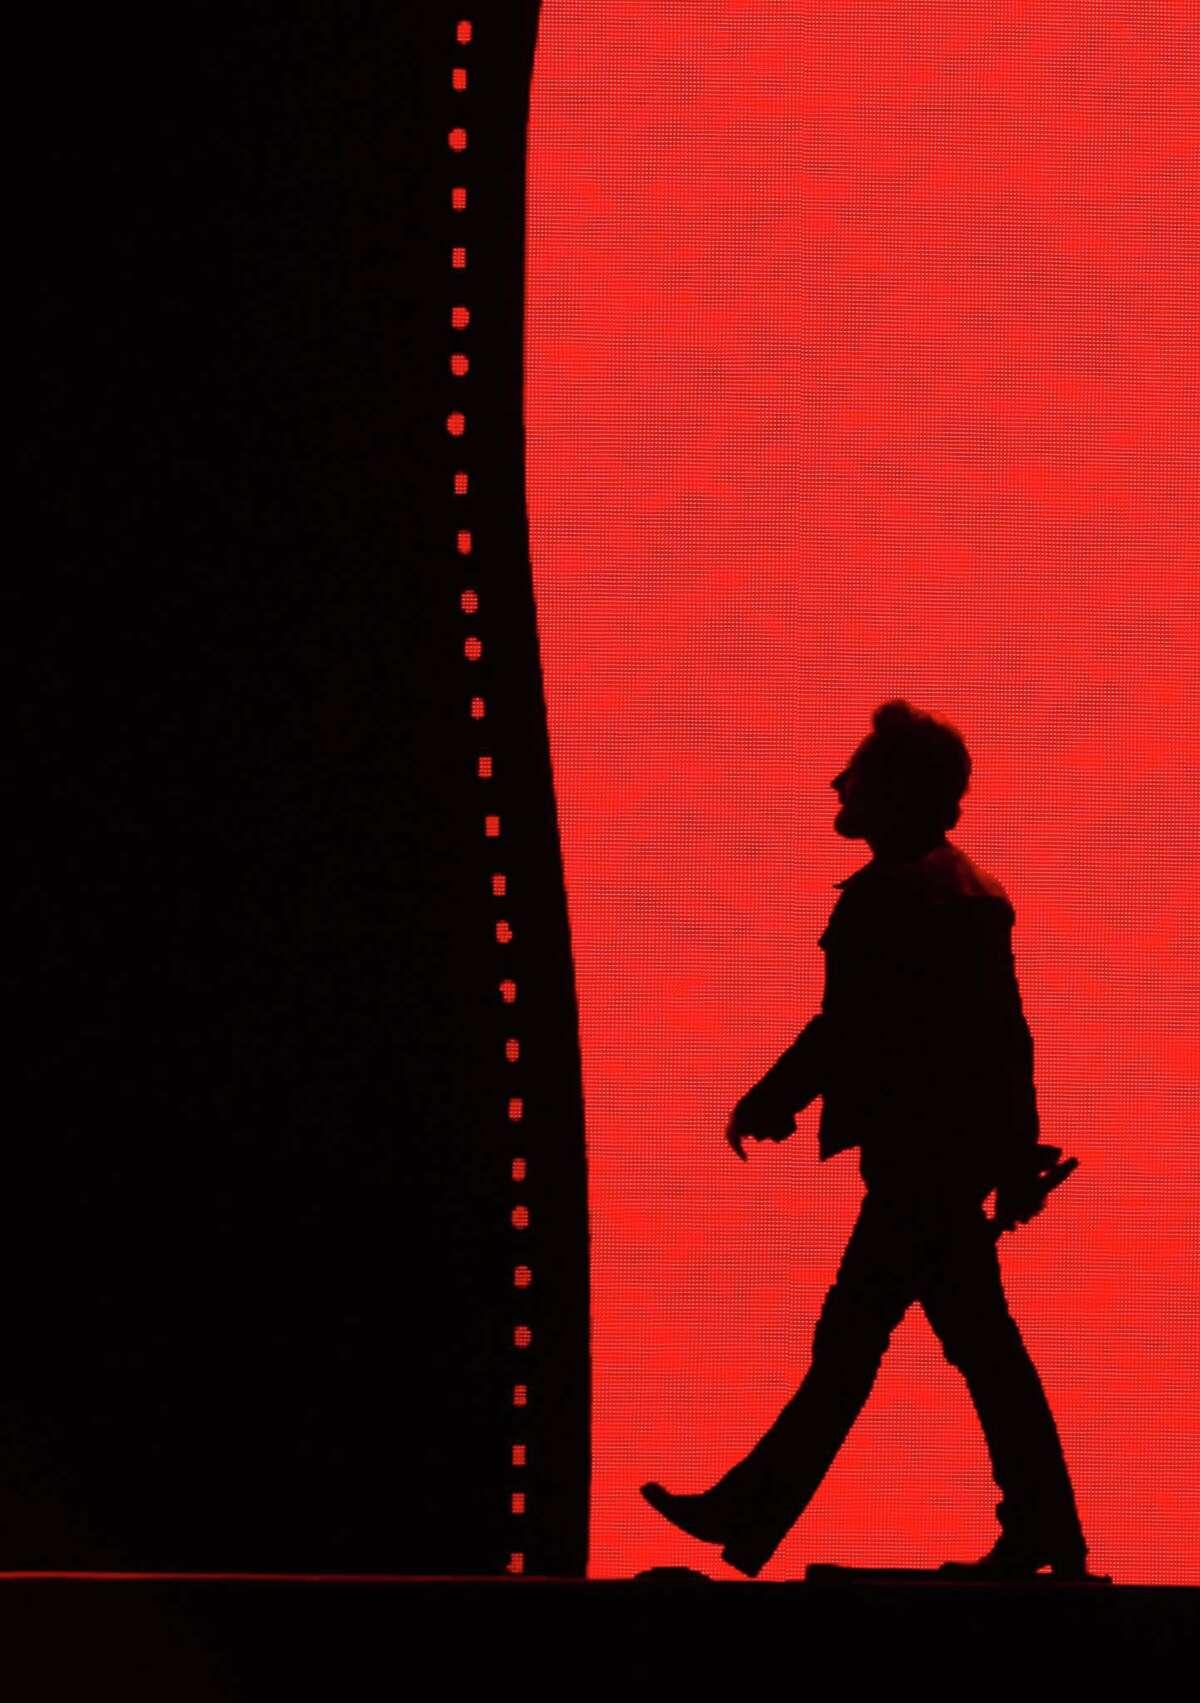 Bono walks downstage as U2 performs at CenturyLink Field, during their 'The Joshua Tree Tour 2017', Sunday, May 14, 2017. (Genna Martin, seattlepi.com)